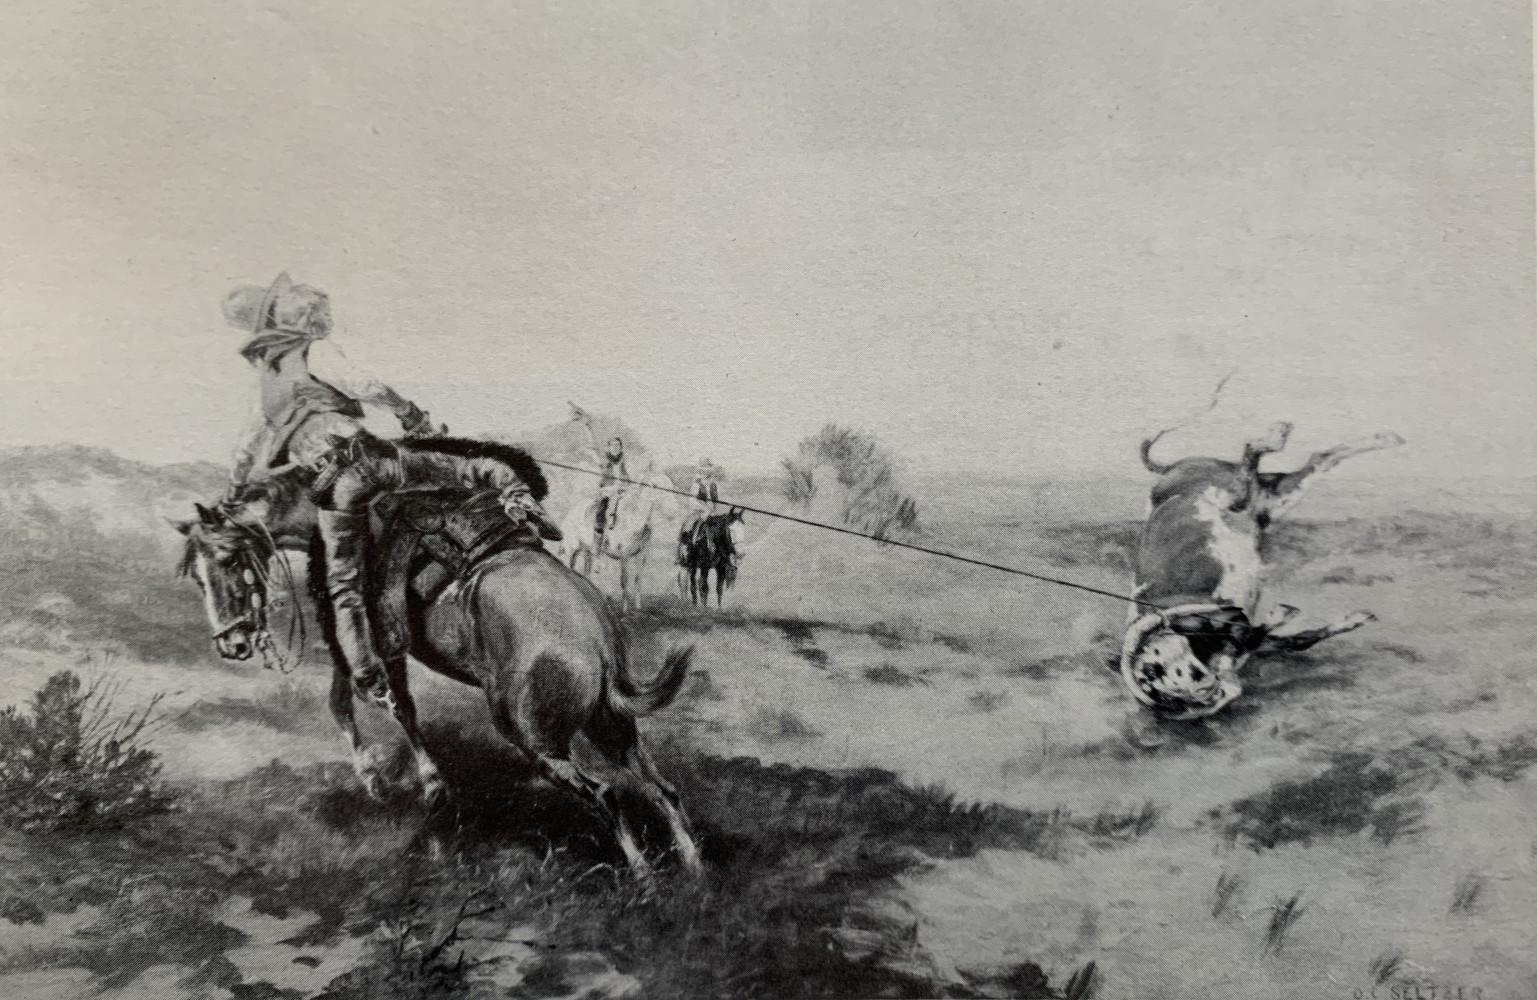 Throwing a Bollet by Olaf Carl Seltzer